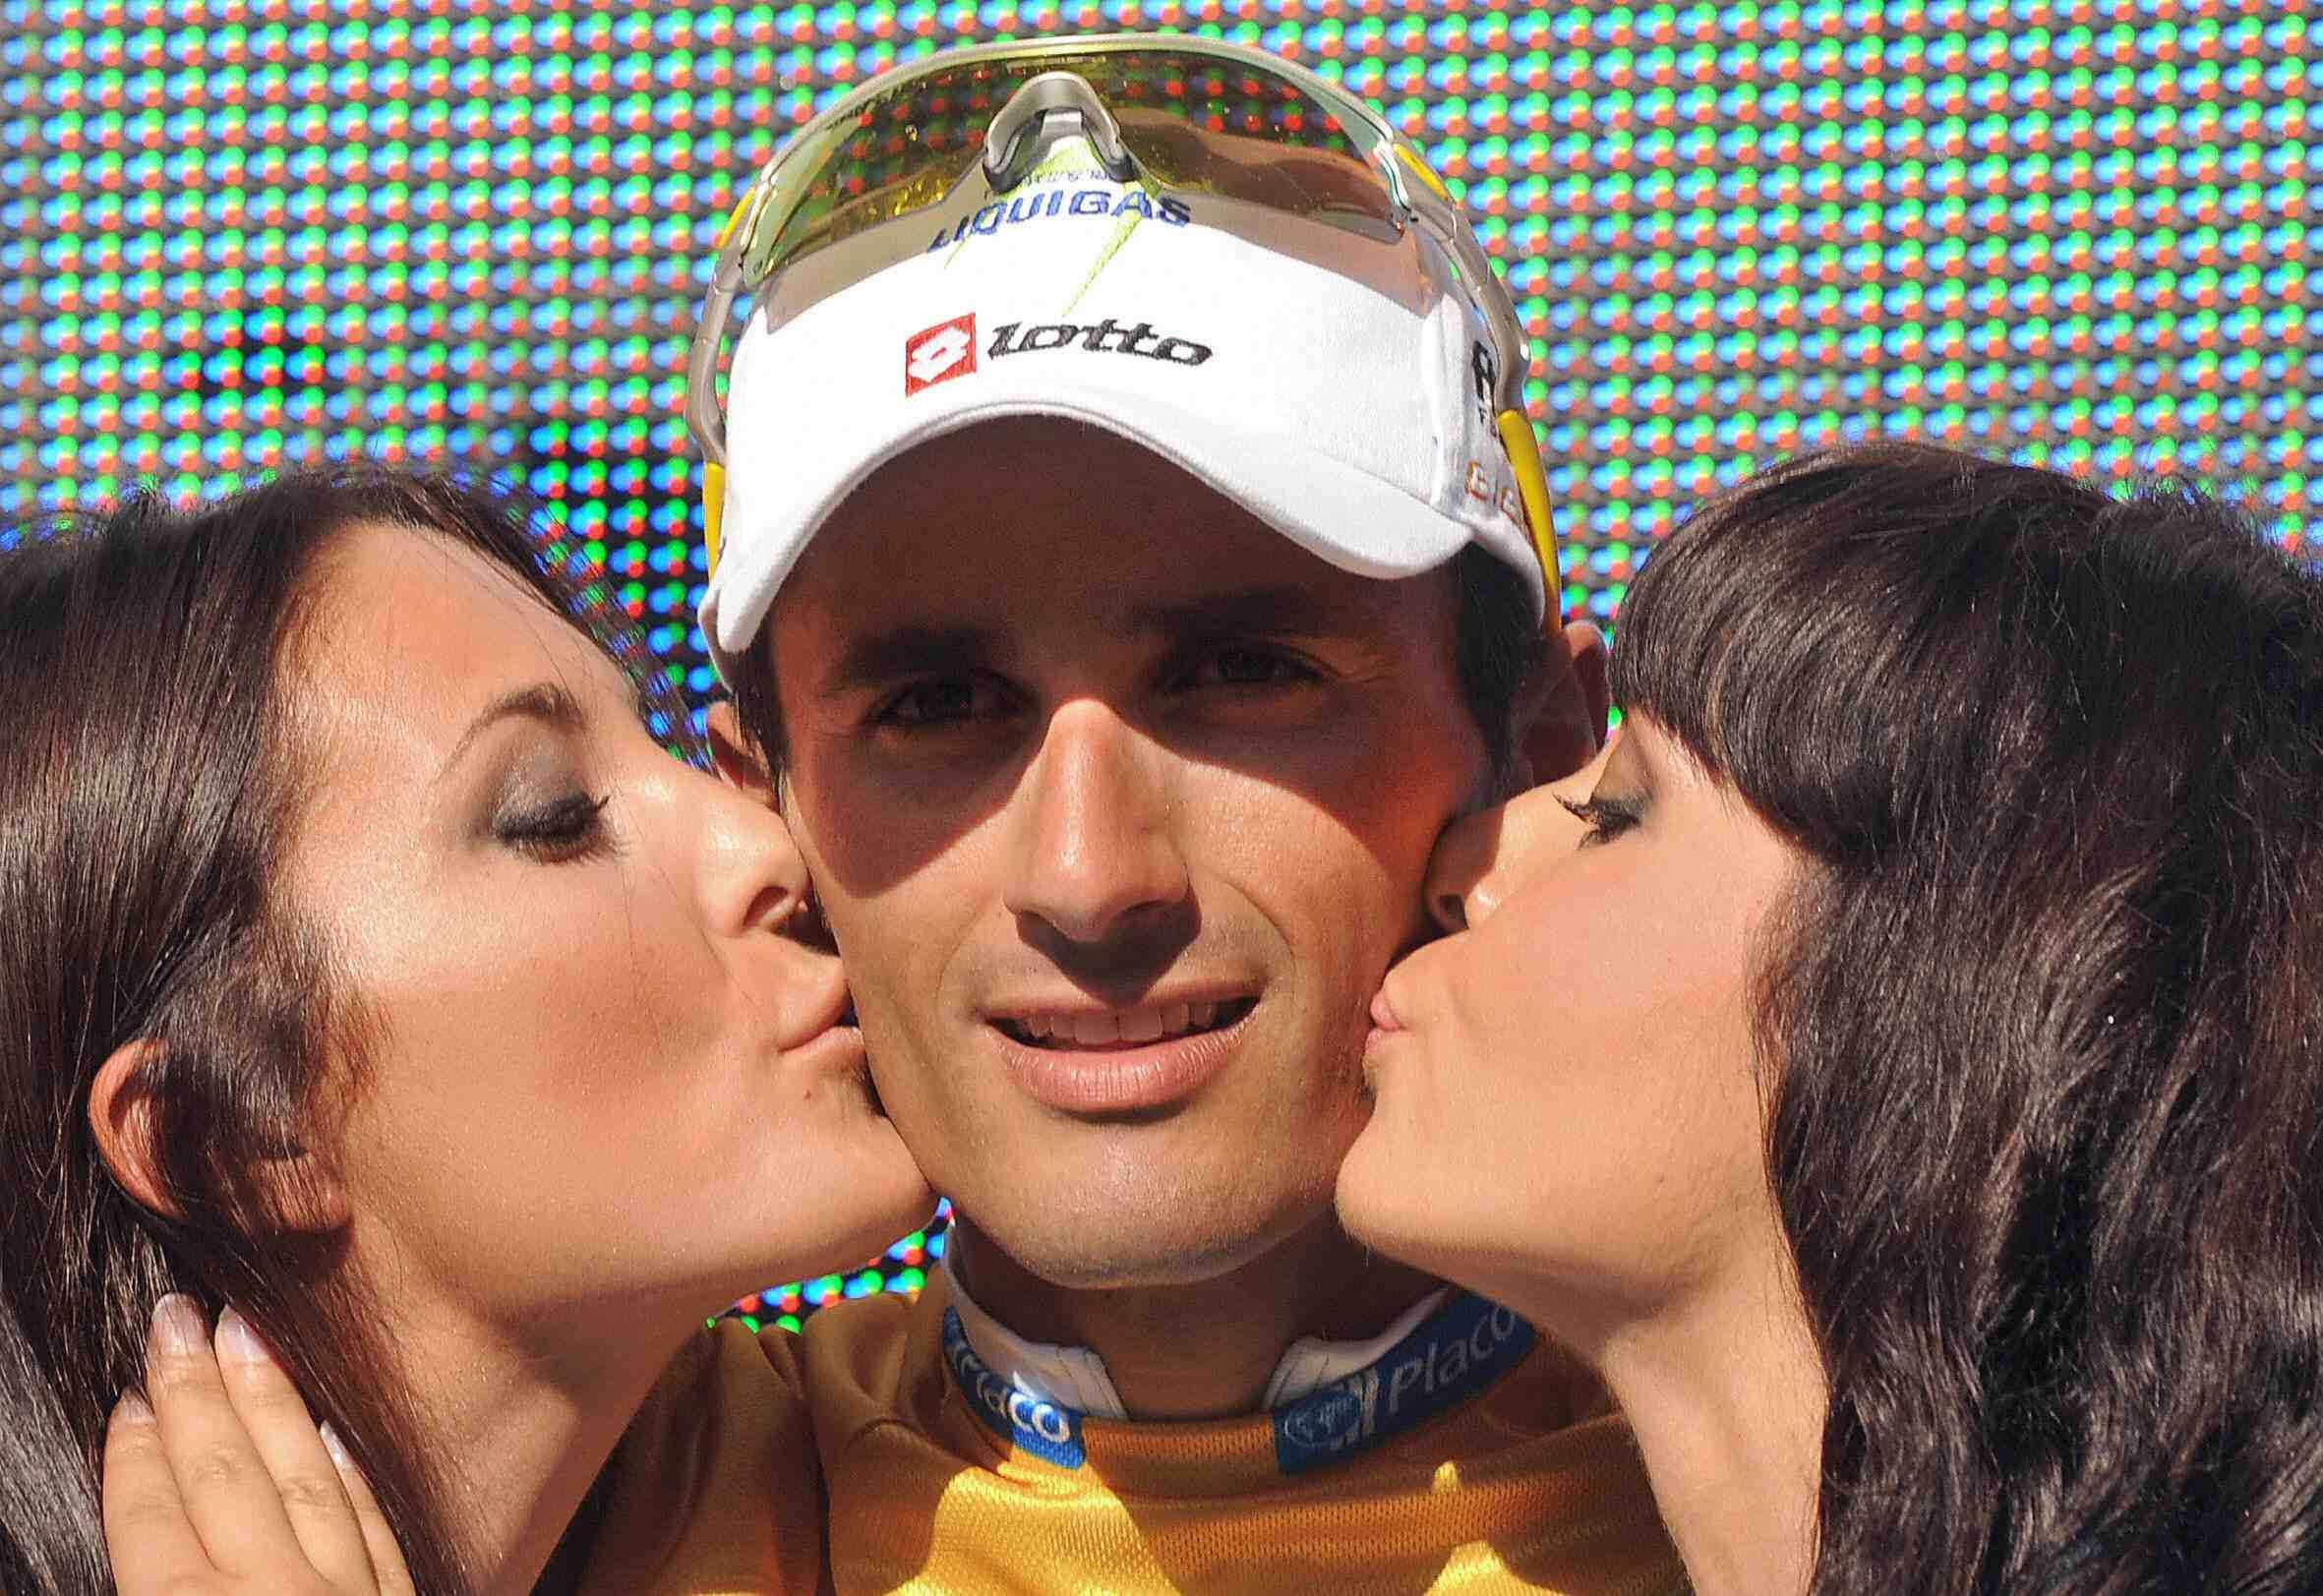 Italian sprinter Daniele Bennati (Liquigas) enjoys his day on the Vuelta podium in September 2008.